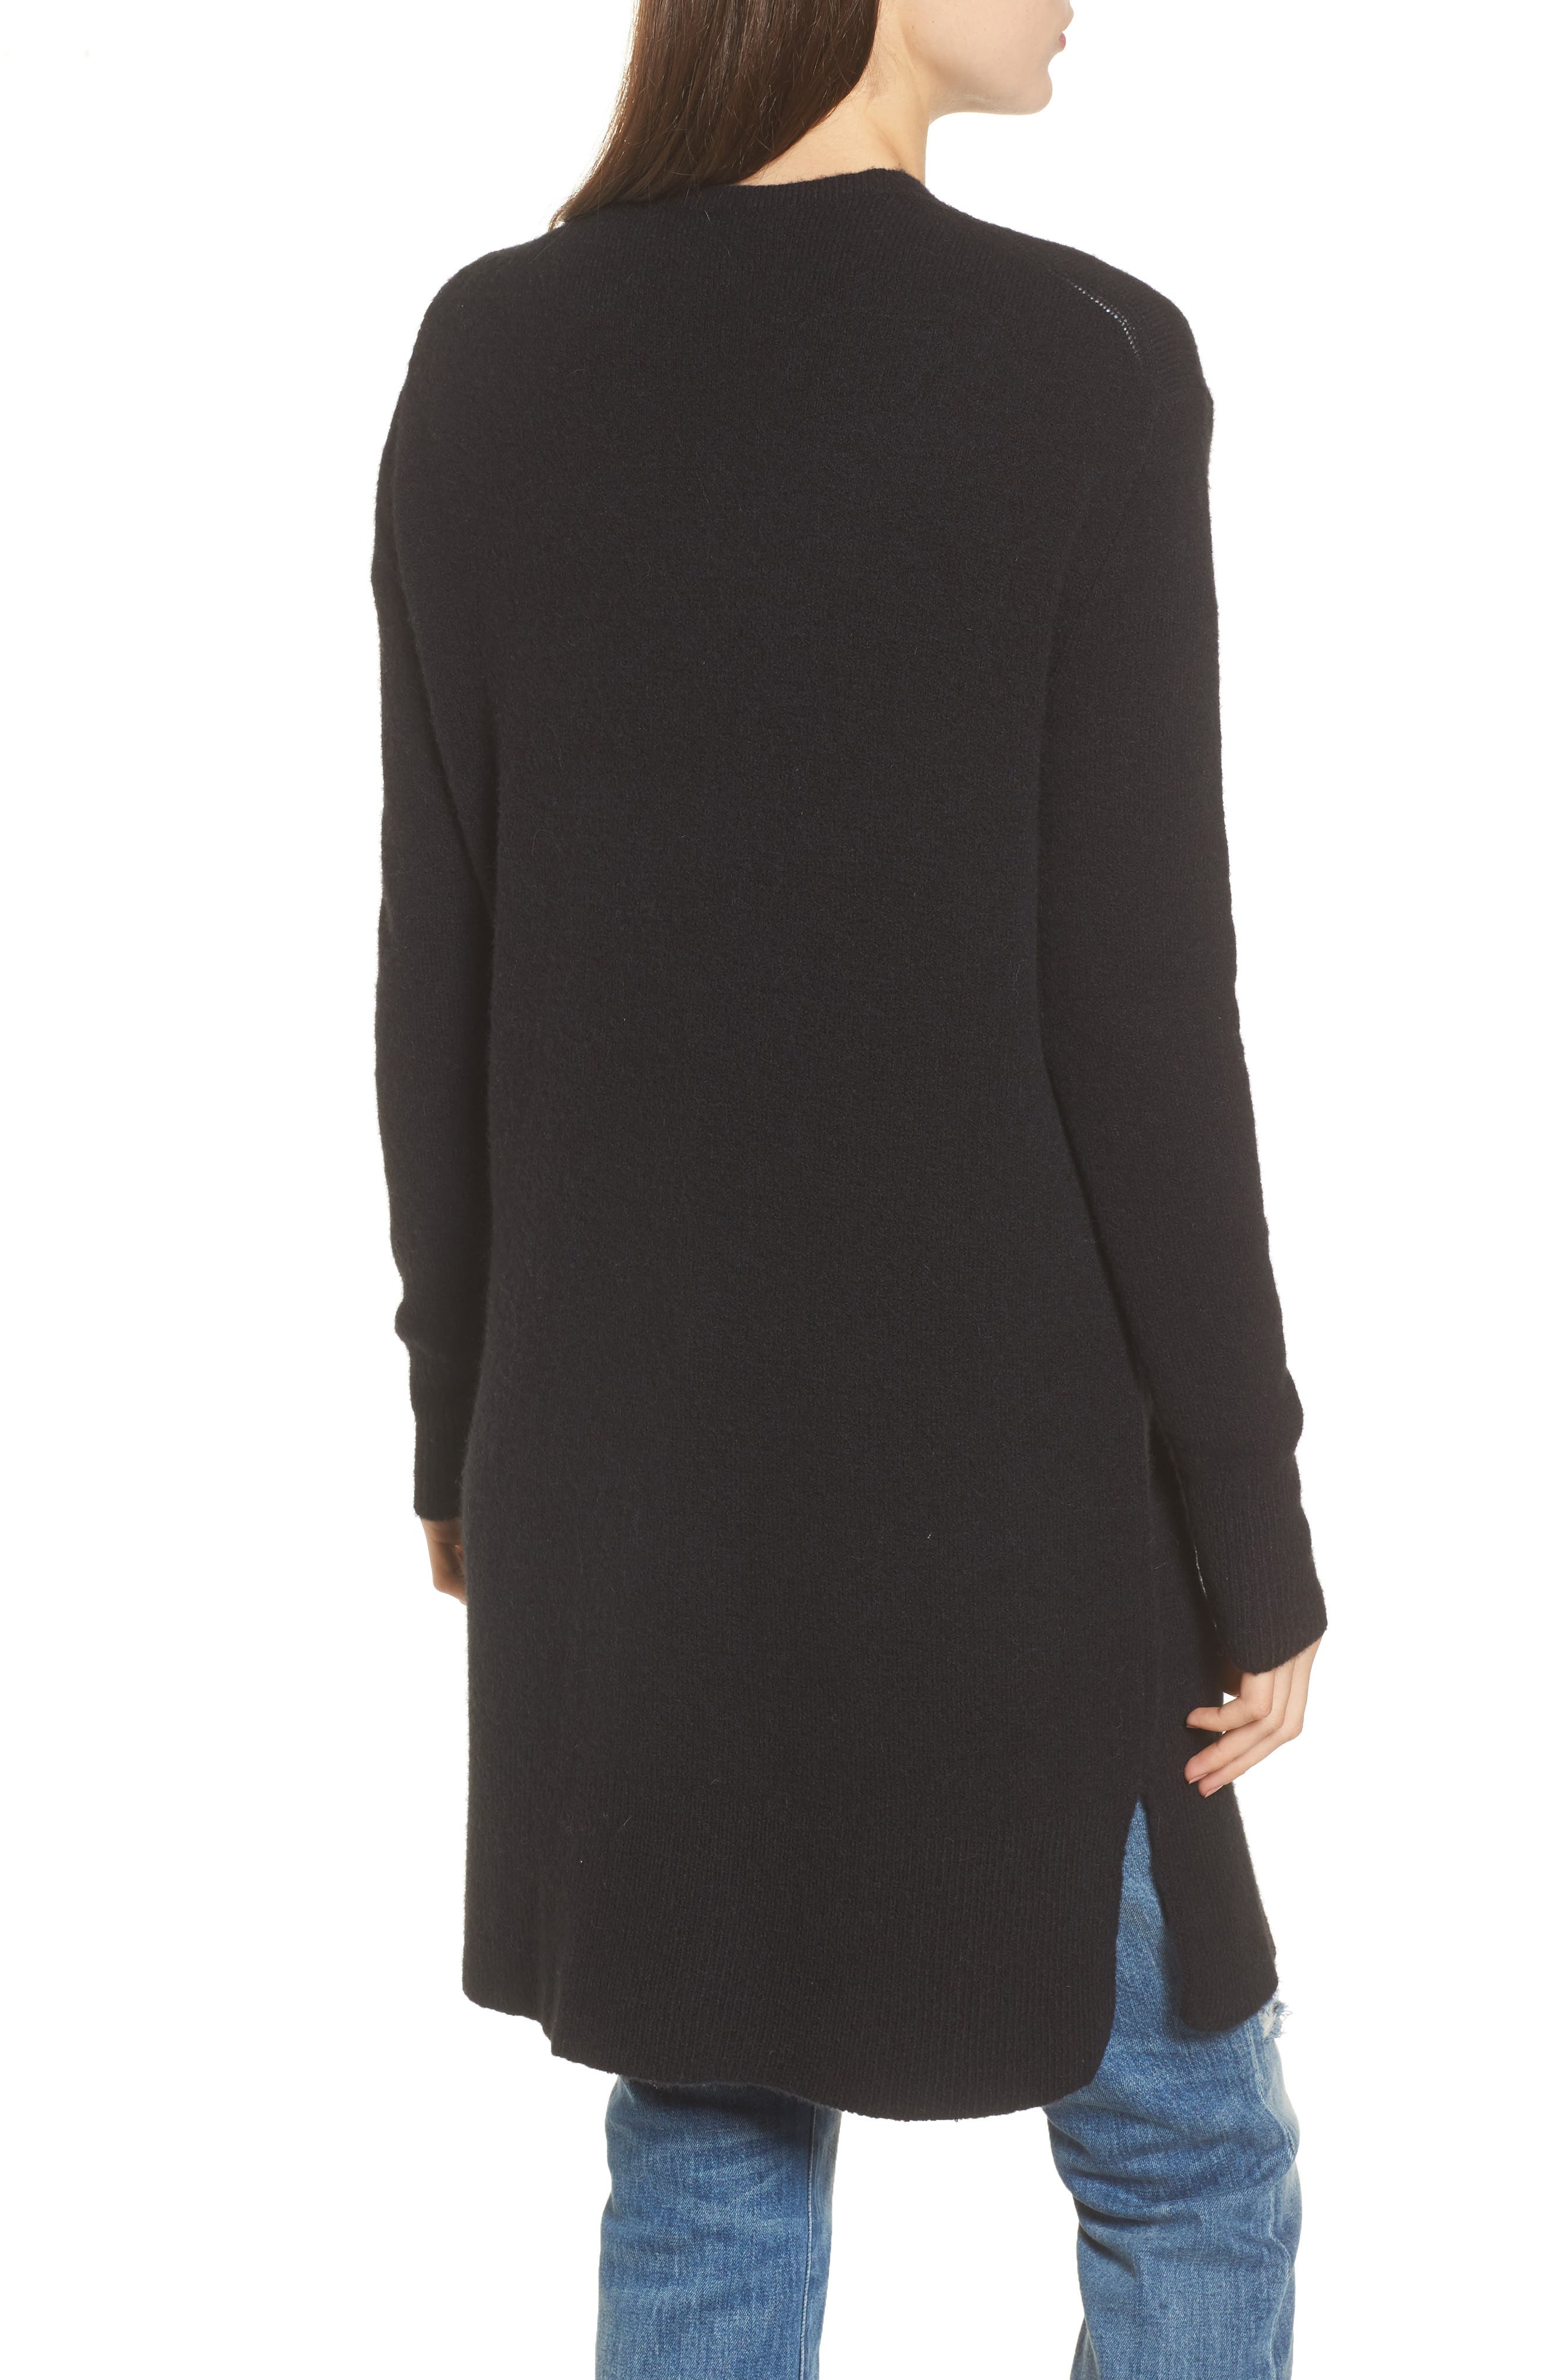 MADEWELL, Kent Cardigan Sweater, Alternate thumbnail 2, color, TRUE BLACK